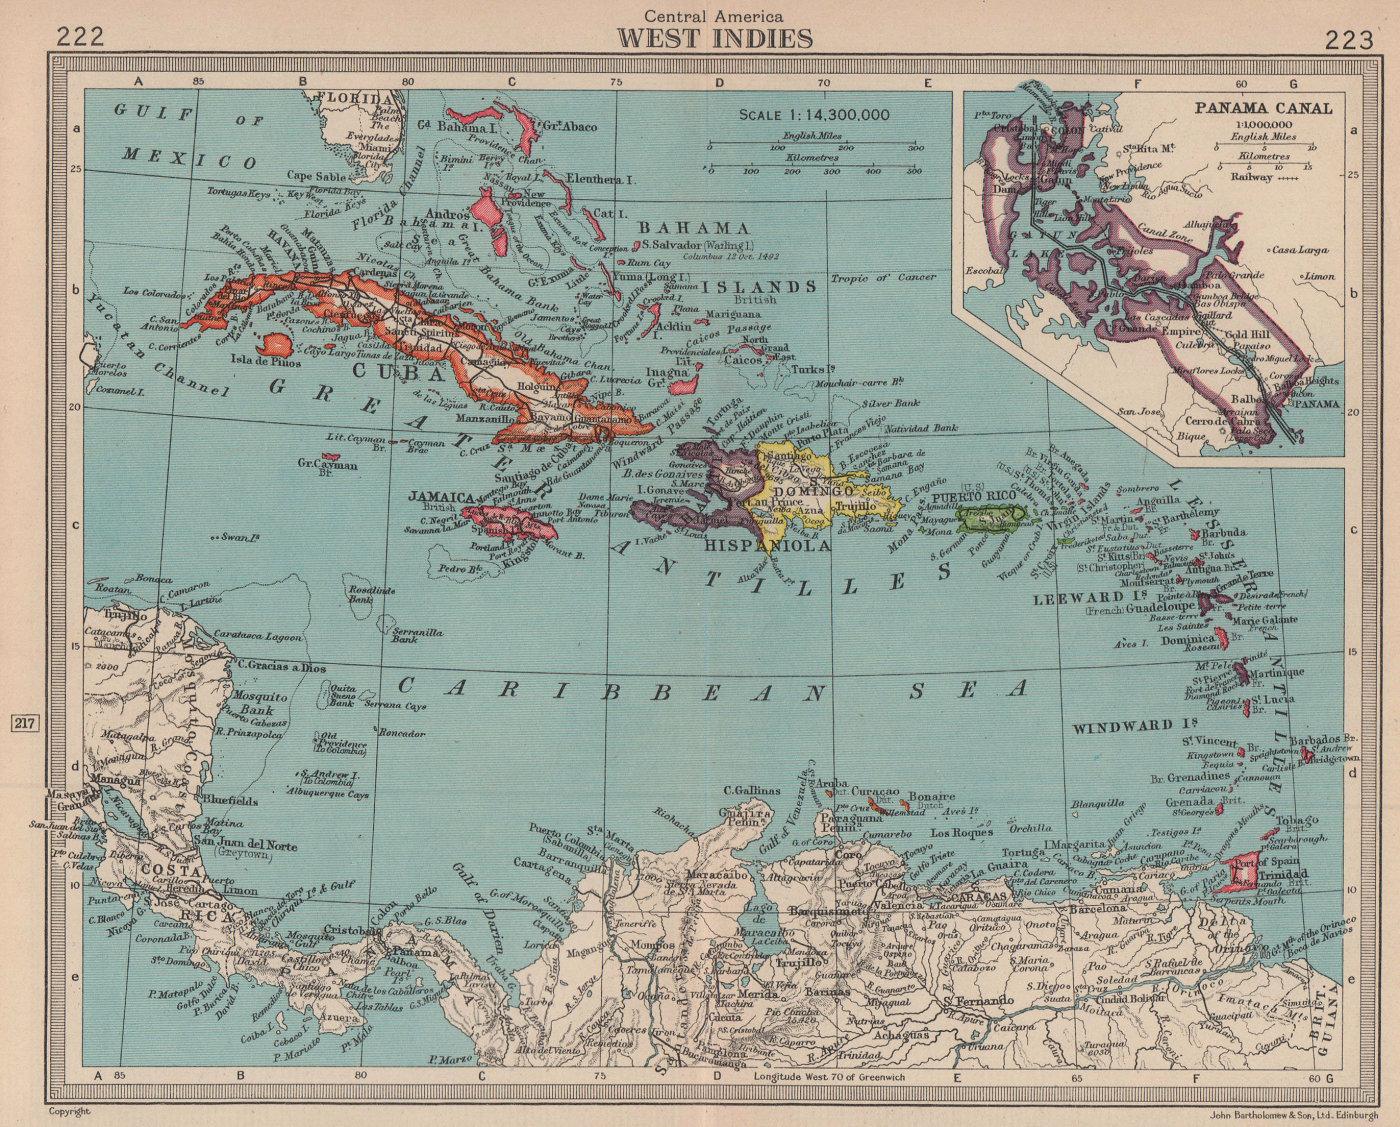 West Indies & Panama Canal. BARTHOLOMEW 1949 old vintage map plan chart